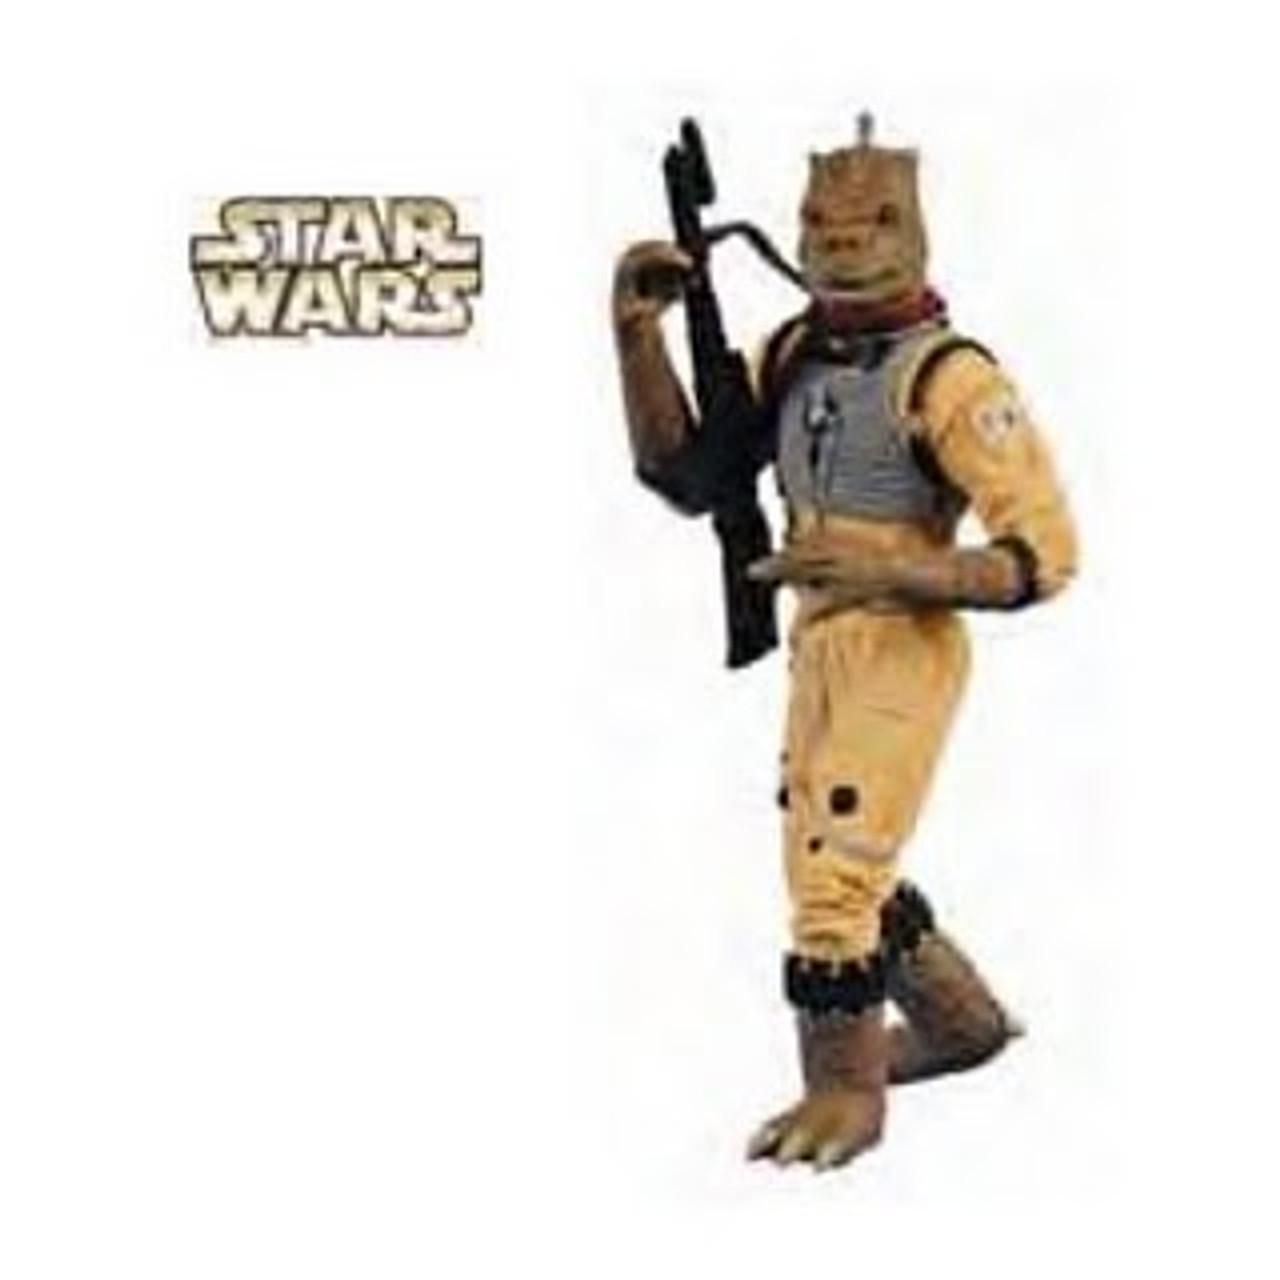 2011 Star Wars Bossk